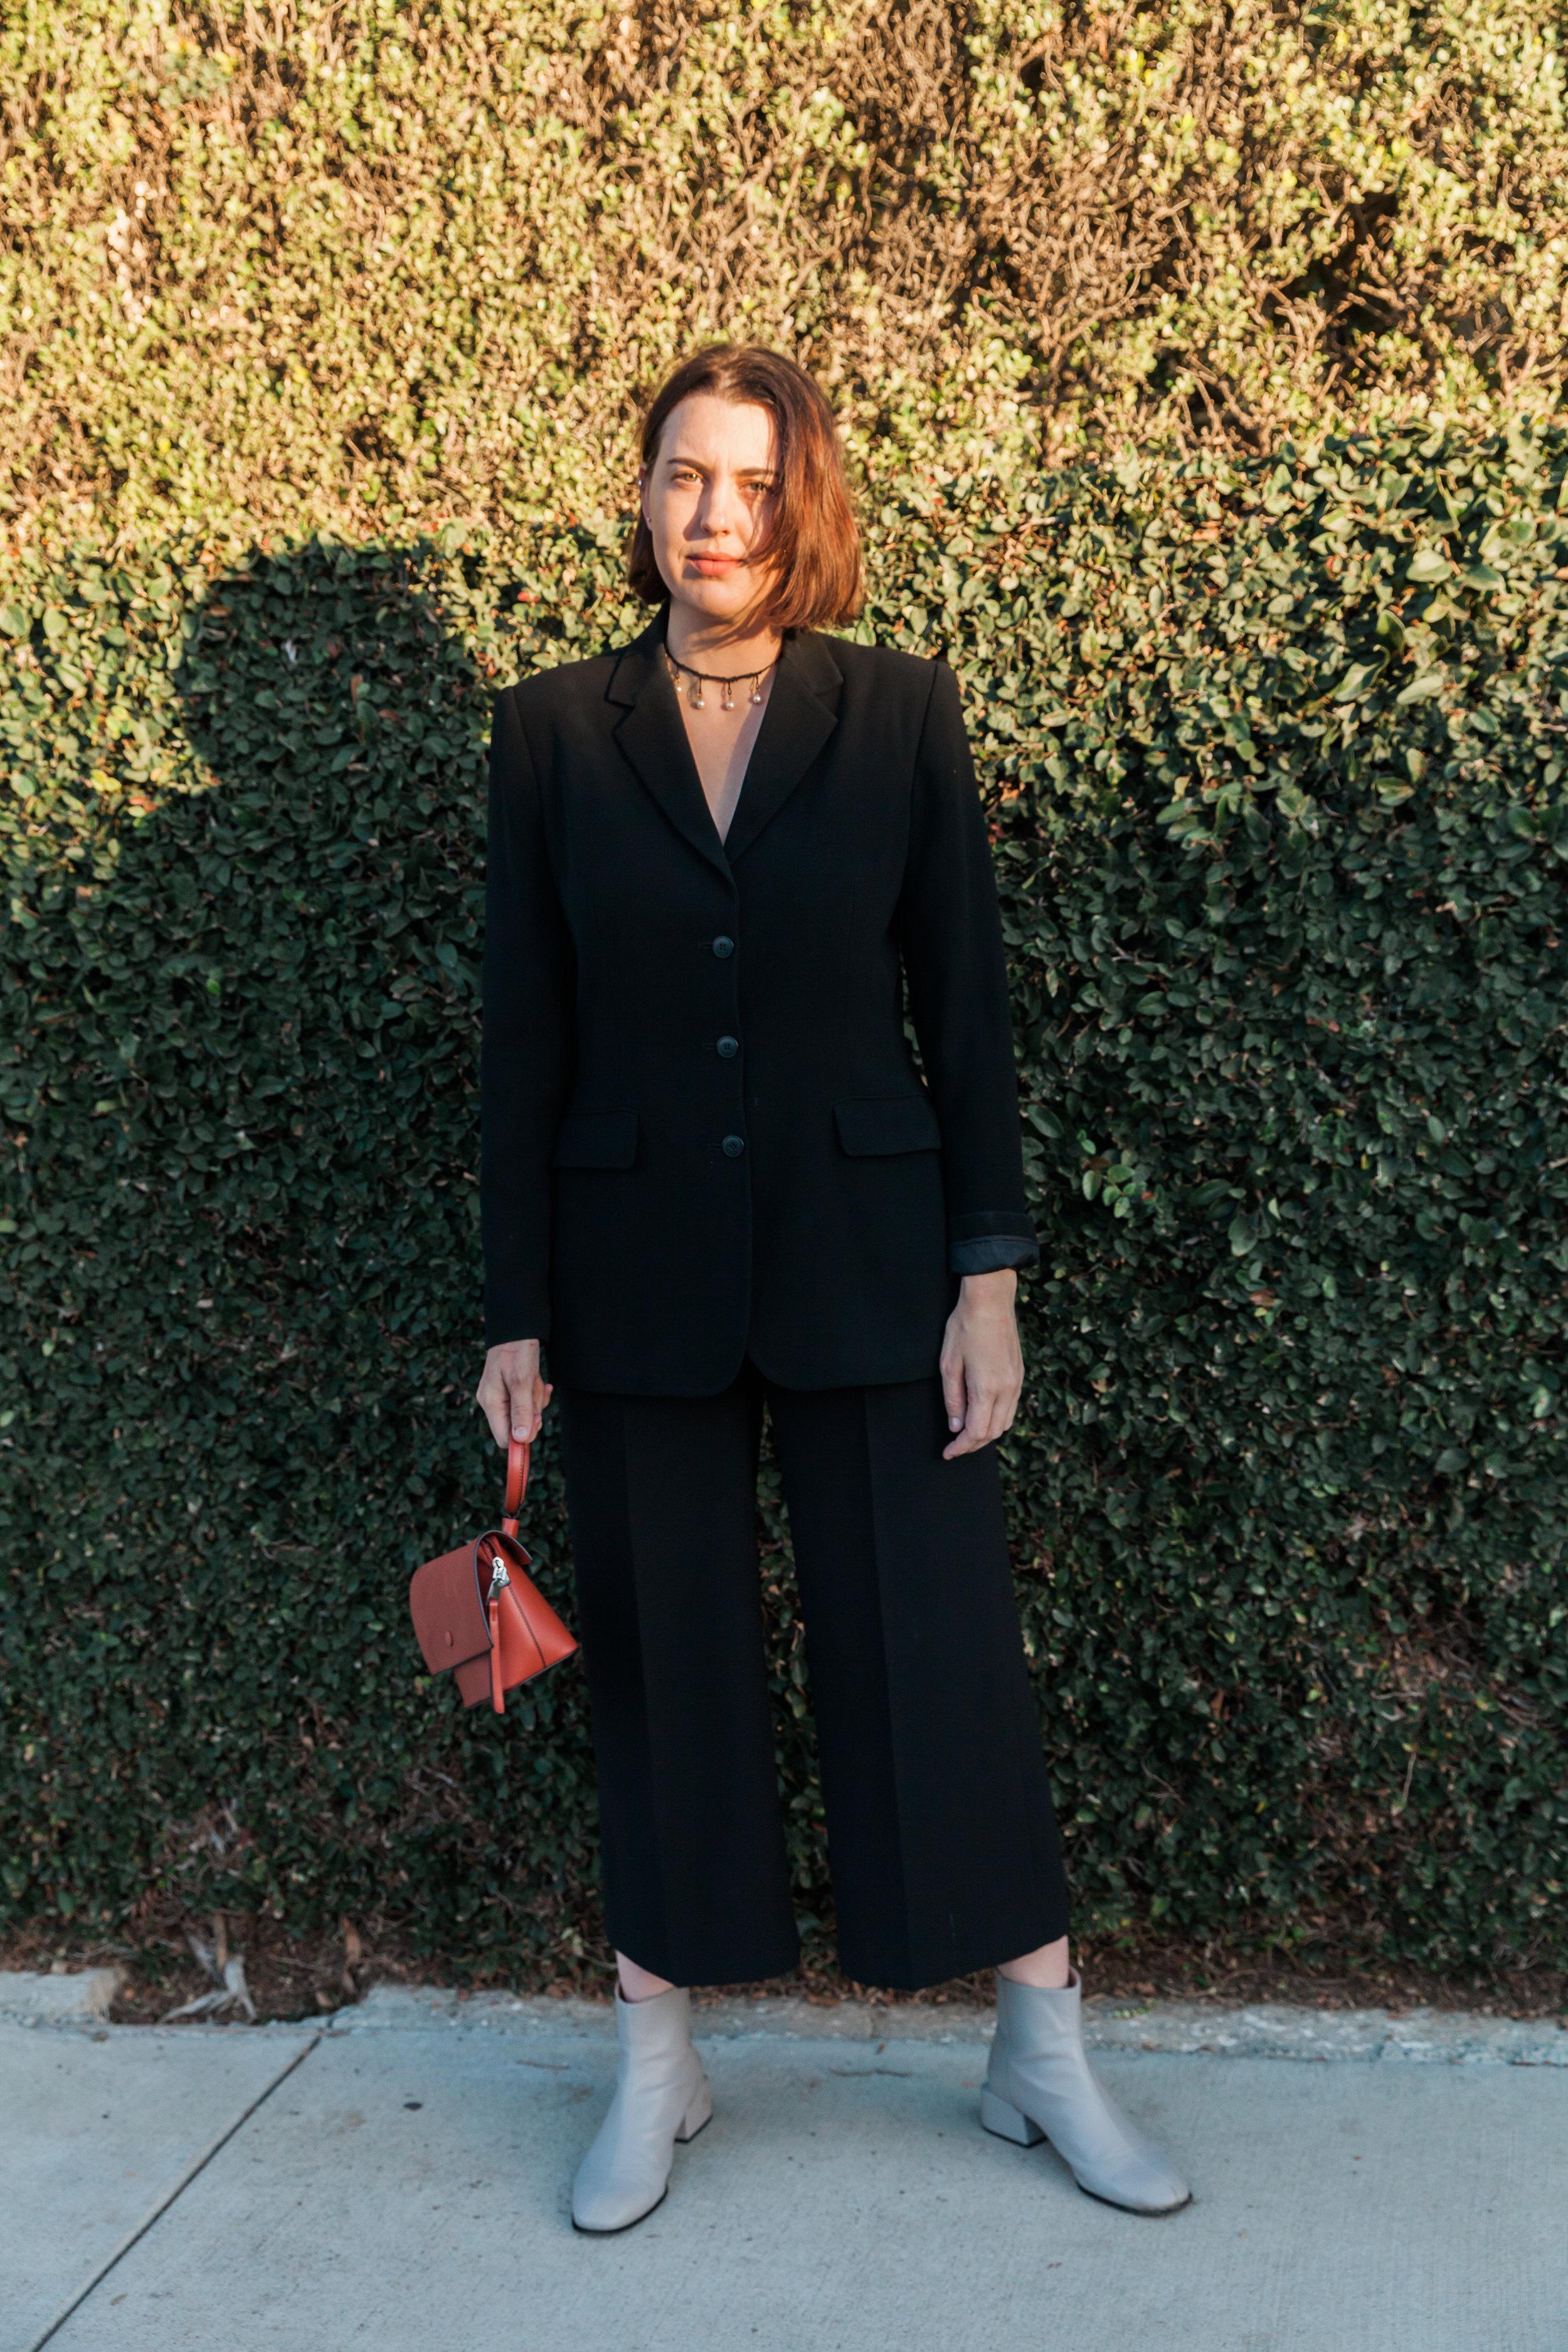 Top: Vintage, Pants: Zara, Boots: Oak + Fort